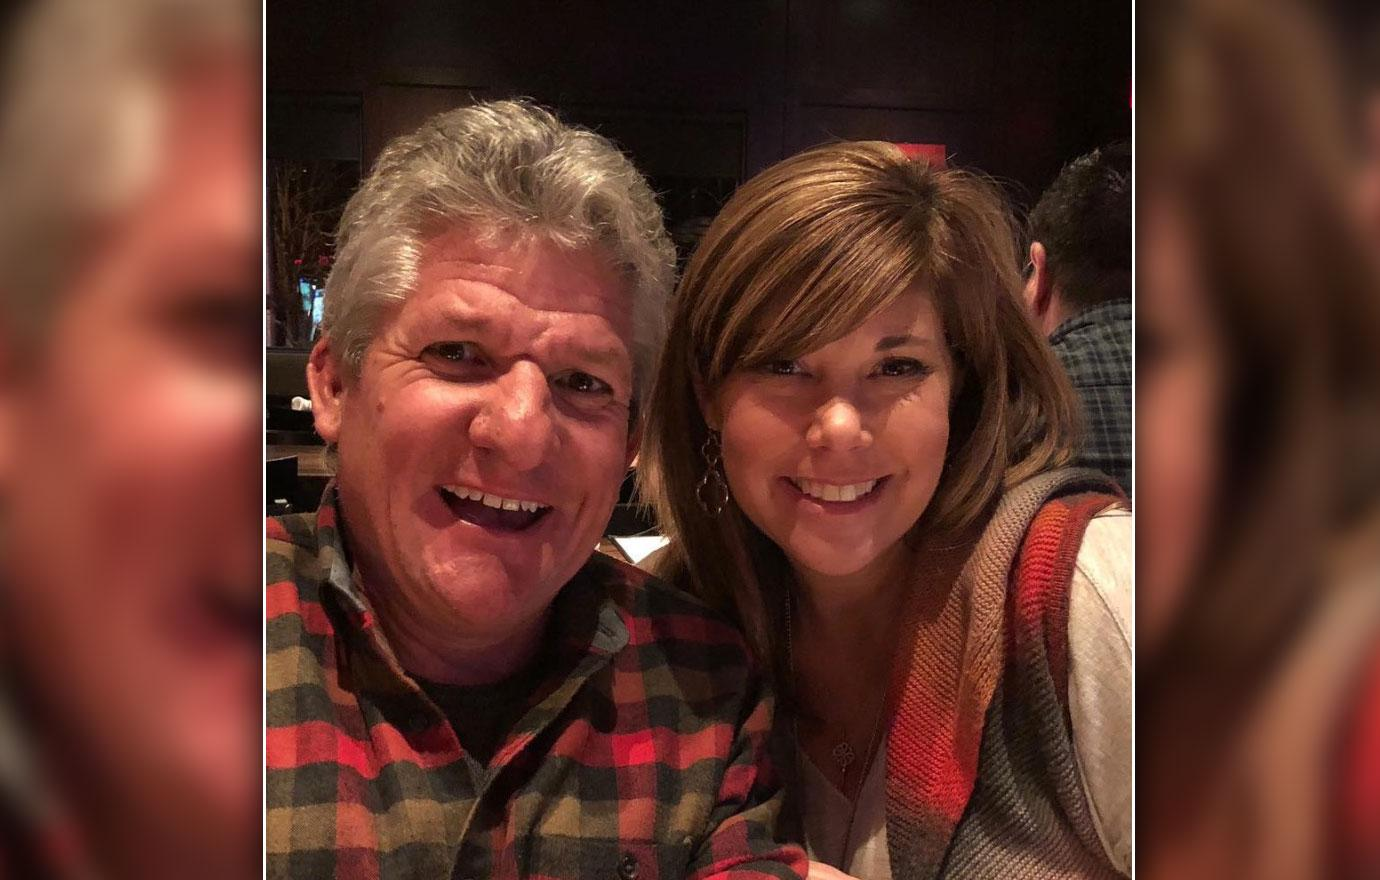 Matt Roloff's Girlfriend Caryn Chandler's Son Says He's Sober After Drug Nightmare